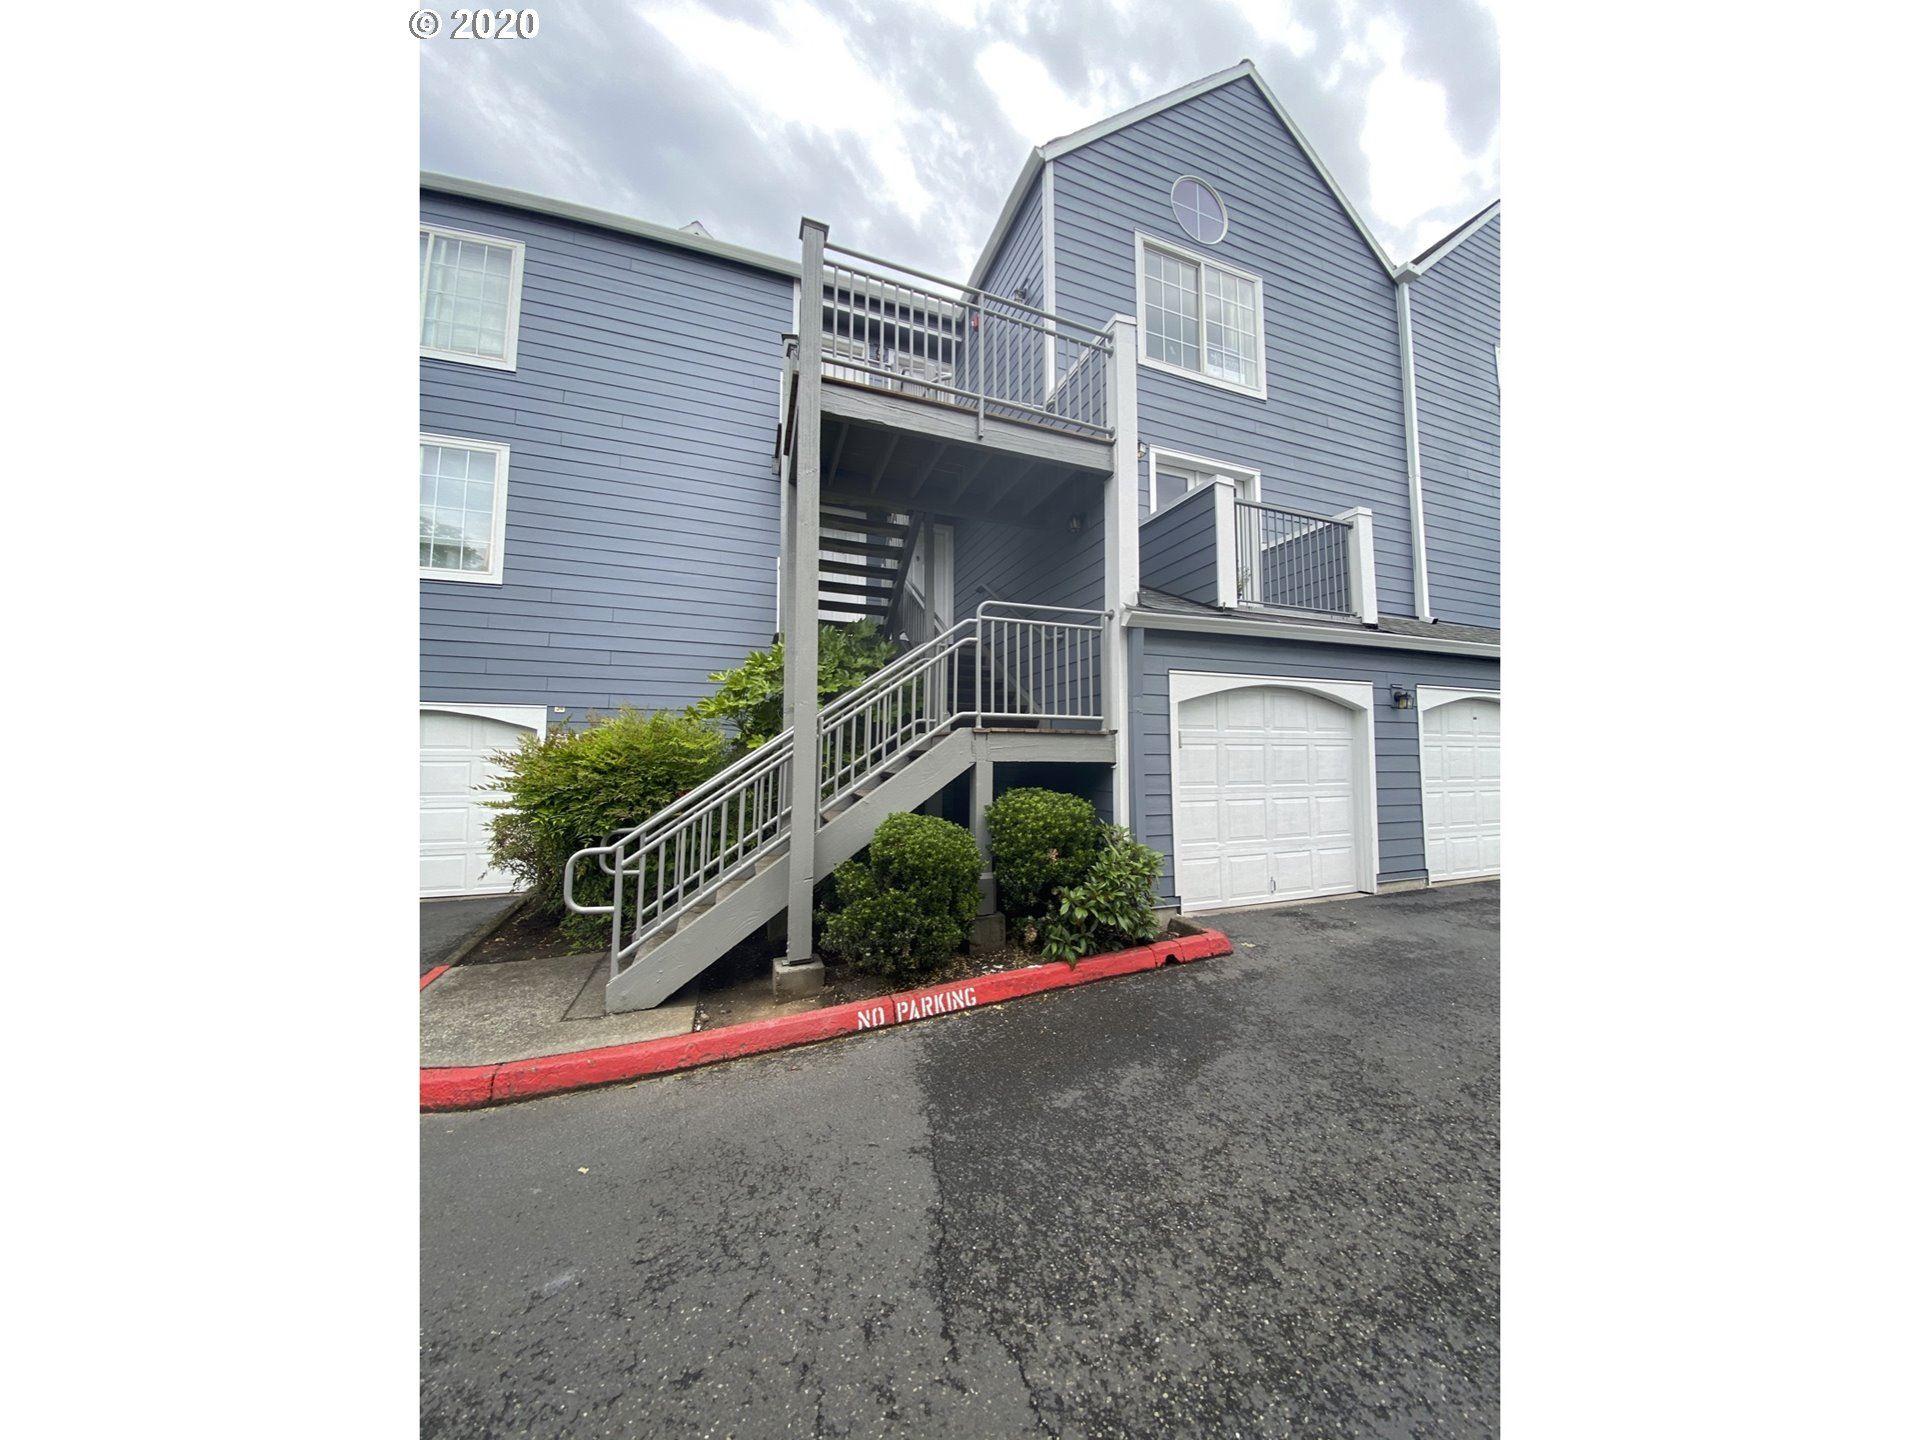 17516 NW SPRINGVILLE RD #B6, Portland, OR 97229 - MLS#: 20668064